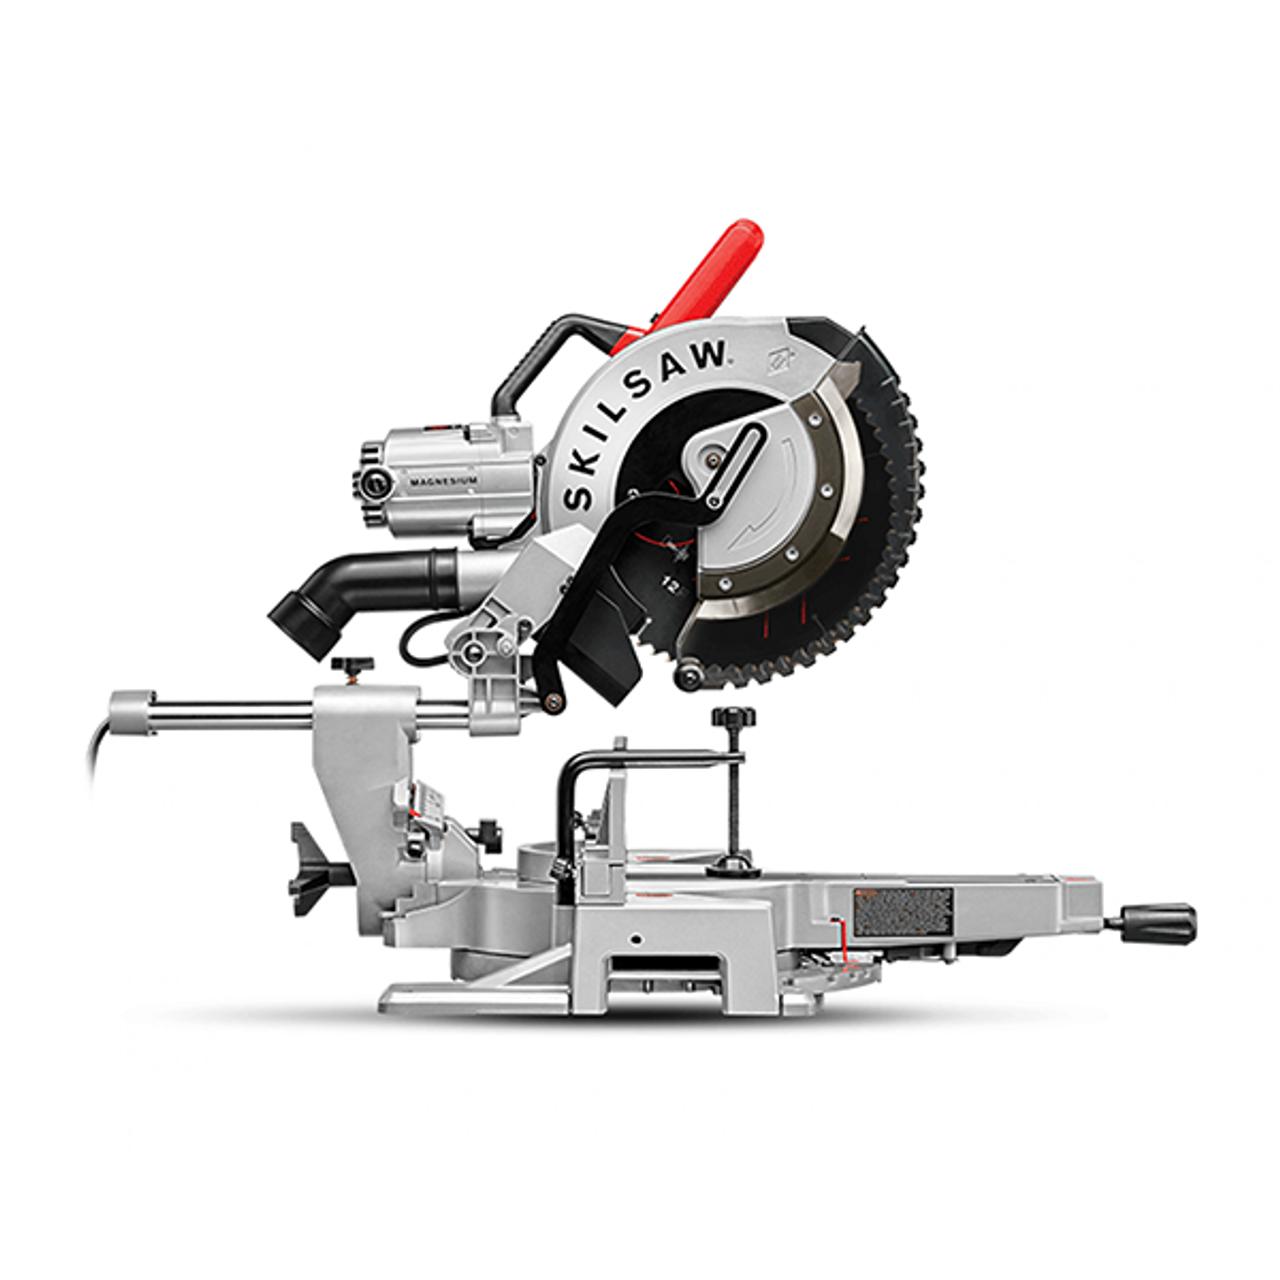 Skilsaw Spt88 01 Worm Drive Dual Bevel 12 Sliding Miter Saw Atlas Machinery